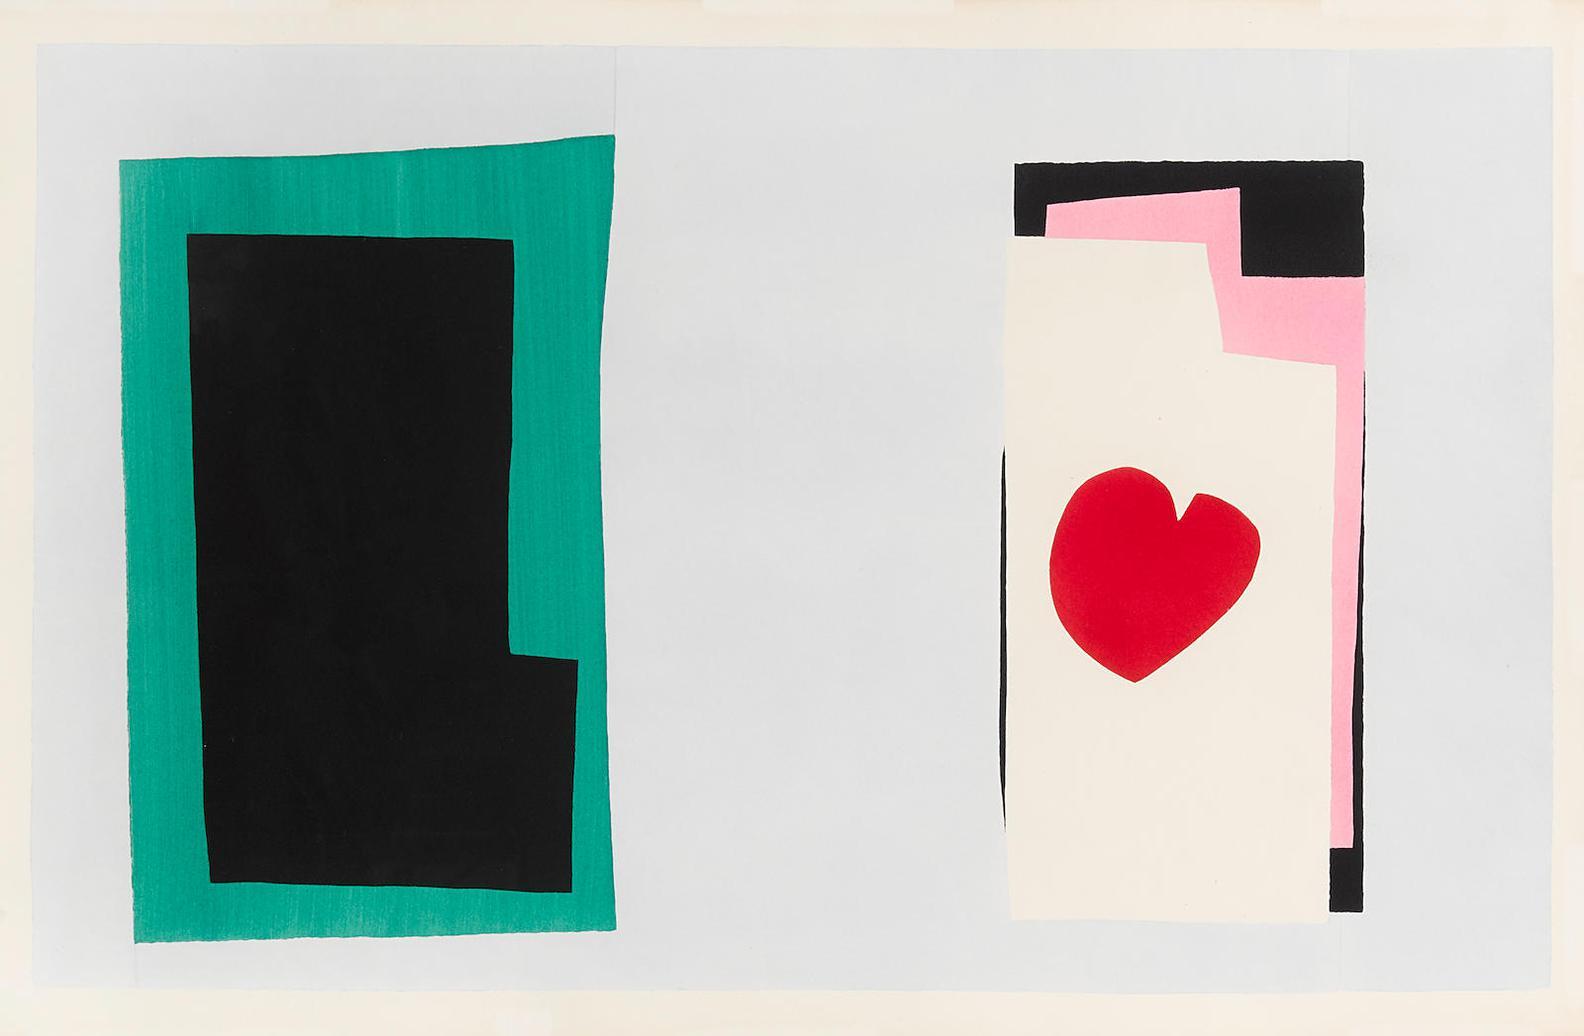 Henri Matisse-Le Coeur, Pl. Vii, From Jazz (D. Bk. 22)-1947